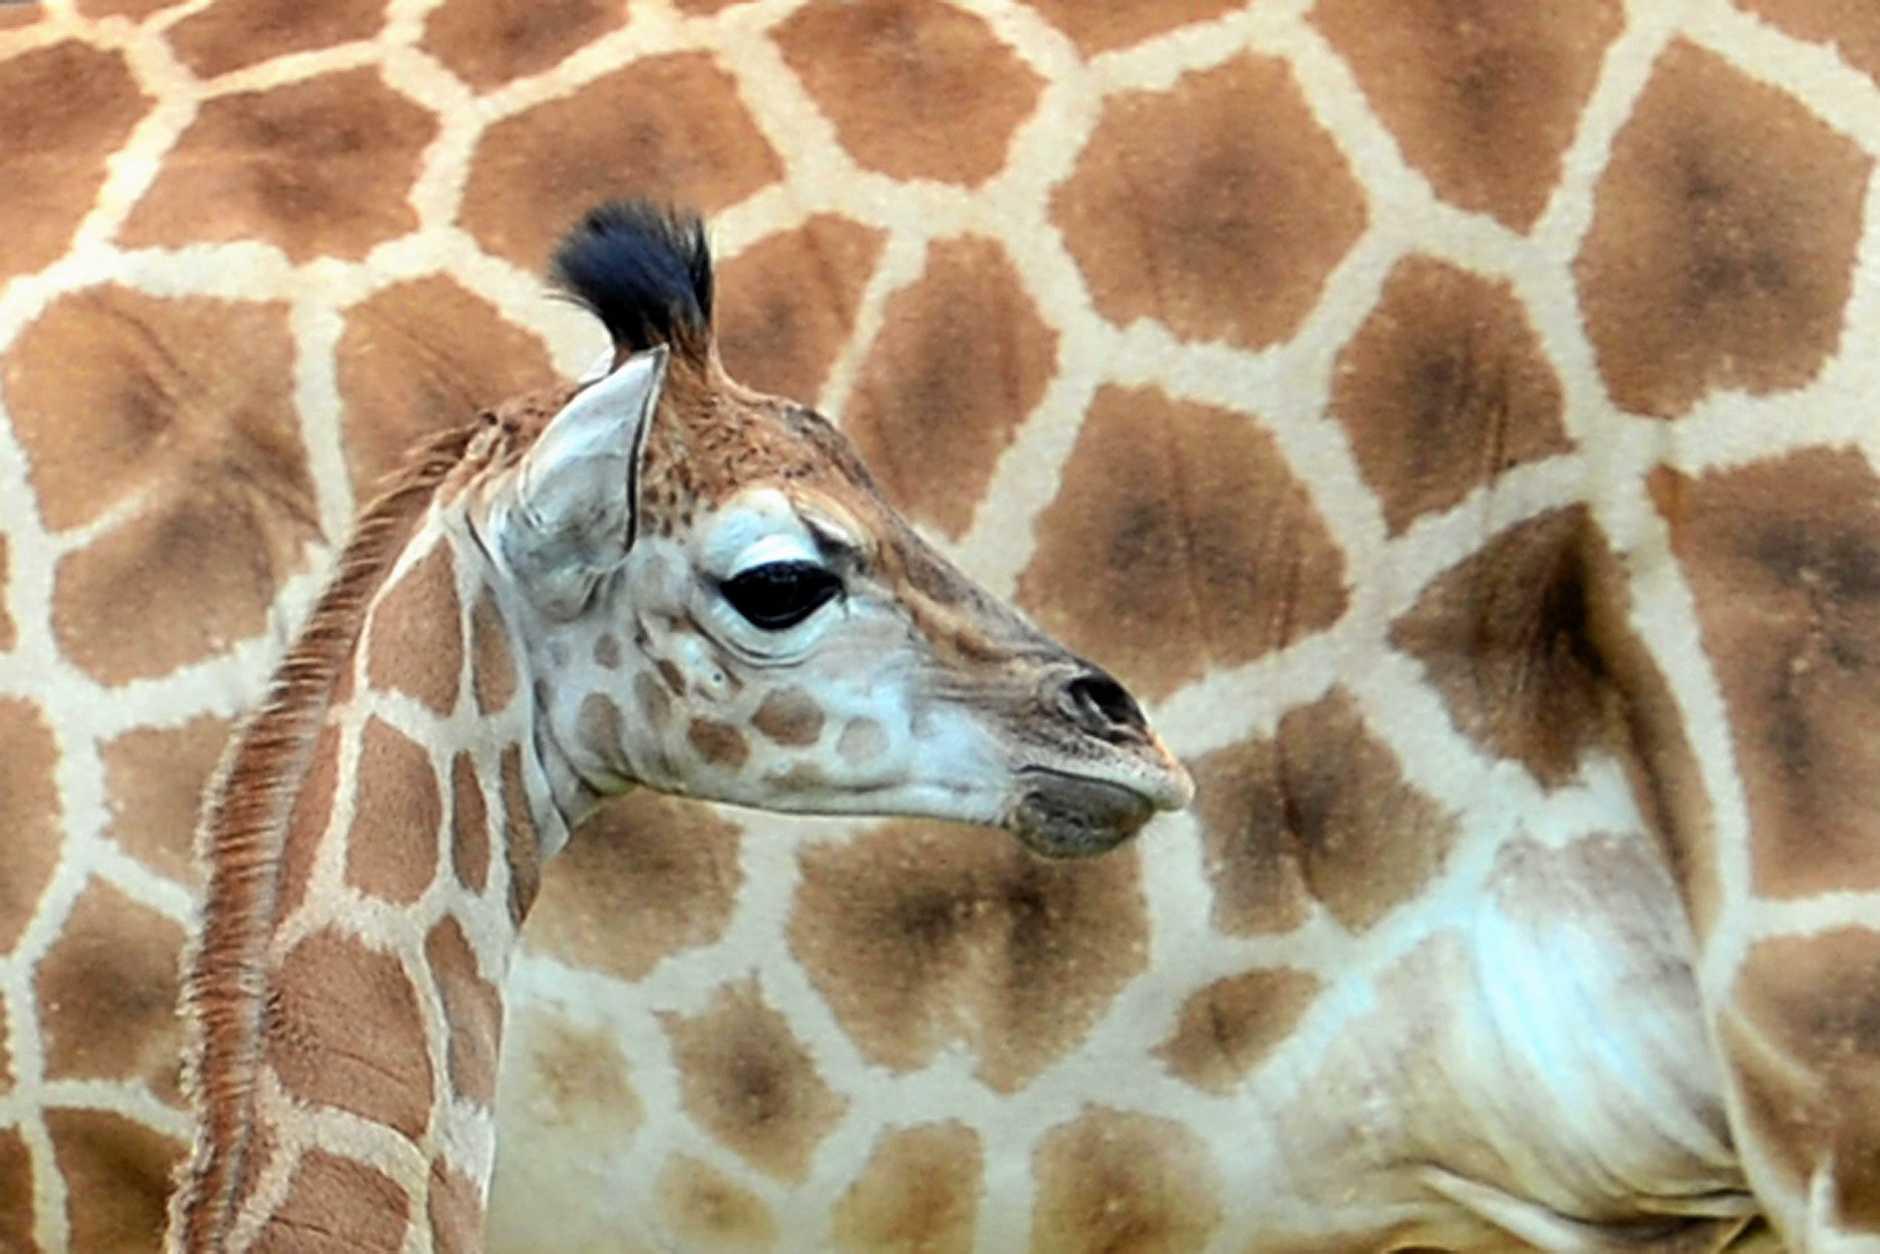 Baby giraffe Sophia at Australia Zoo.